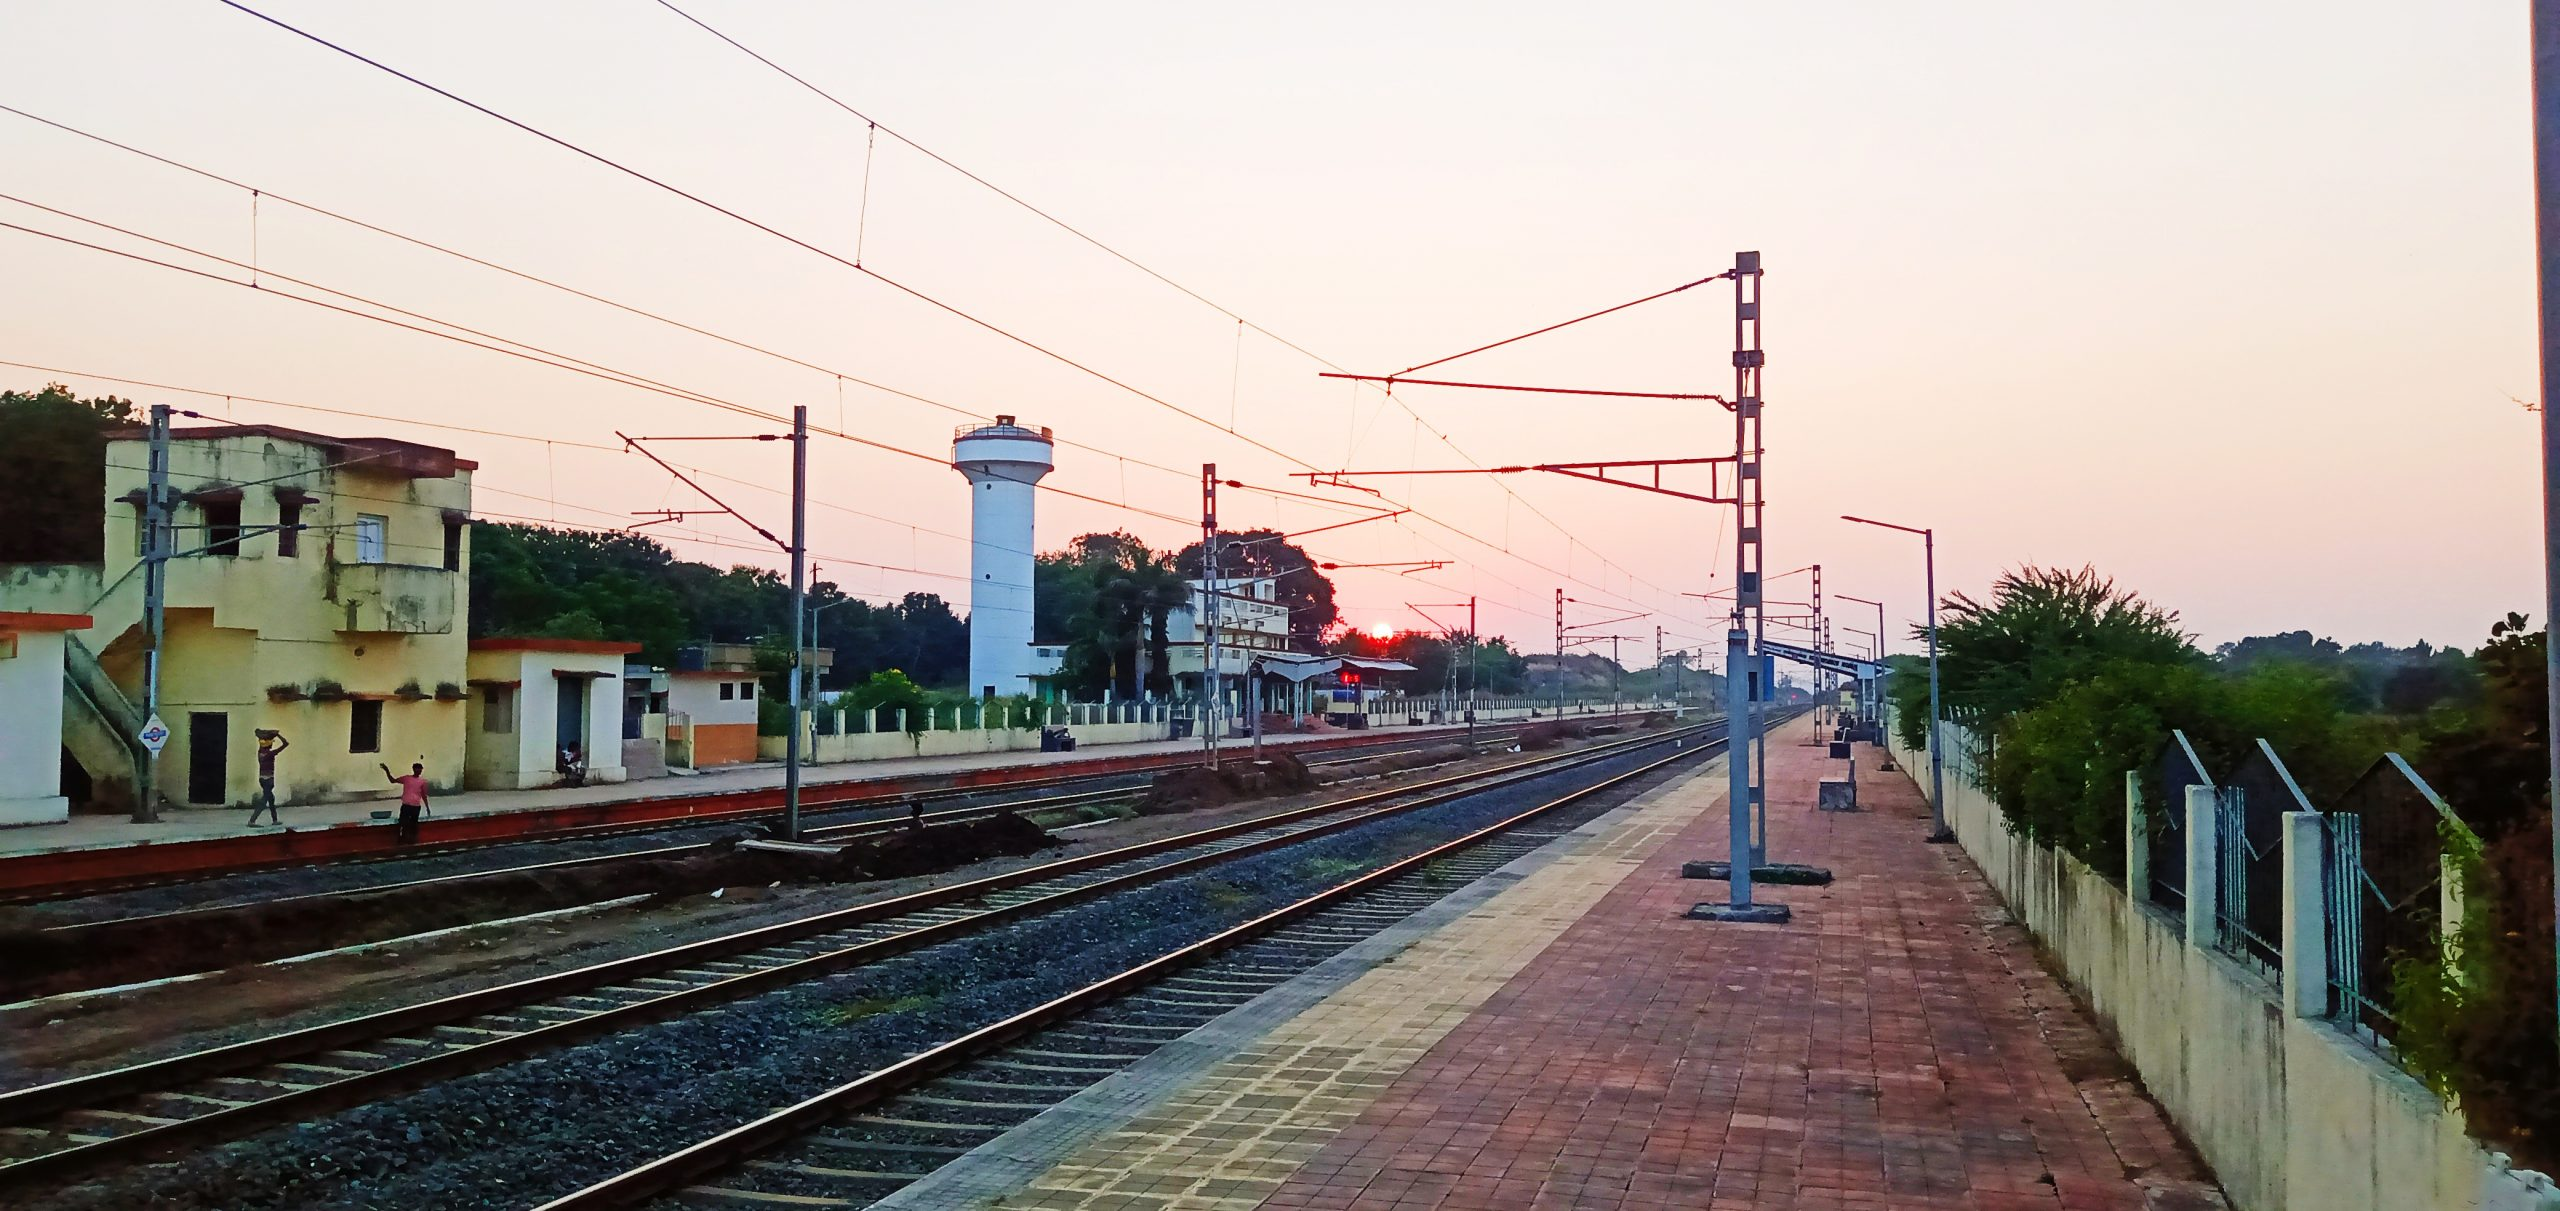 Railway tracks at a station